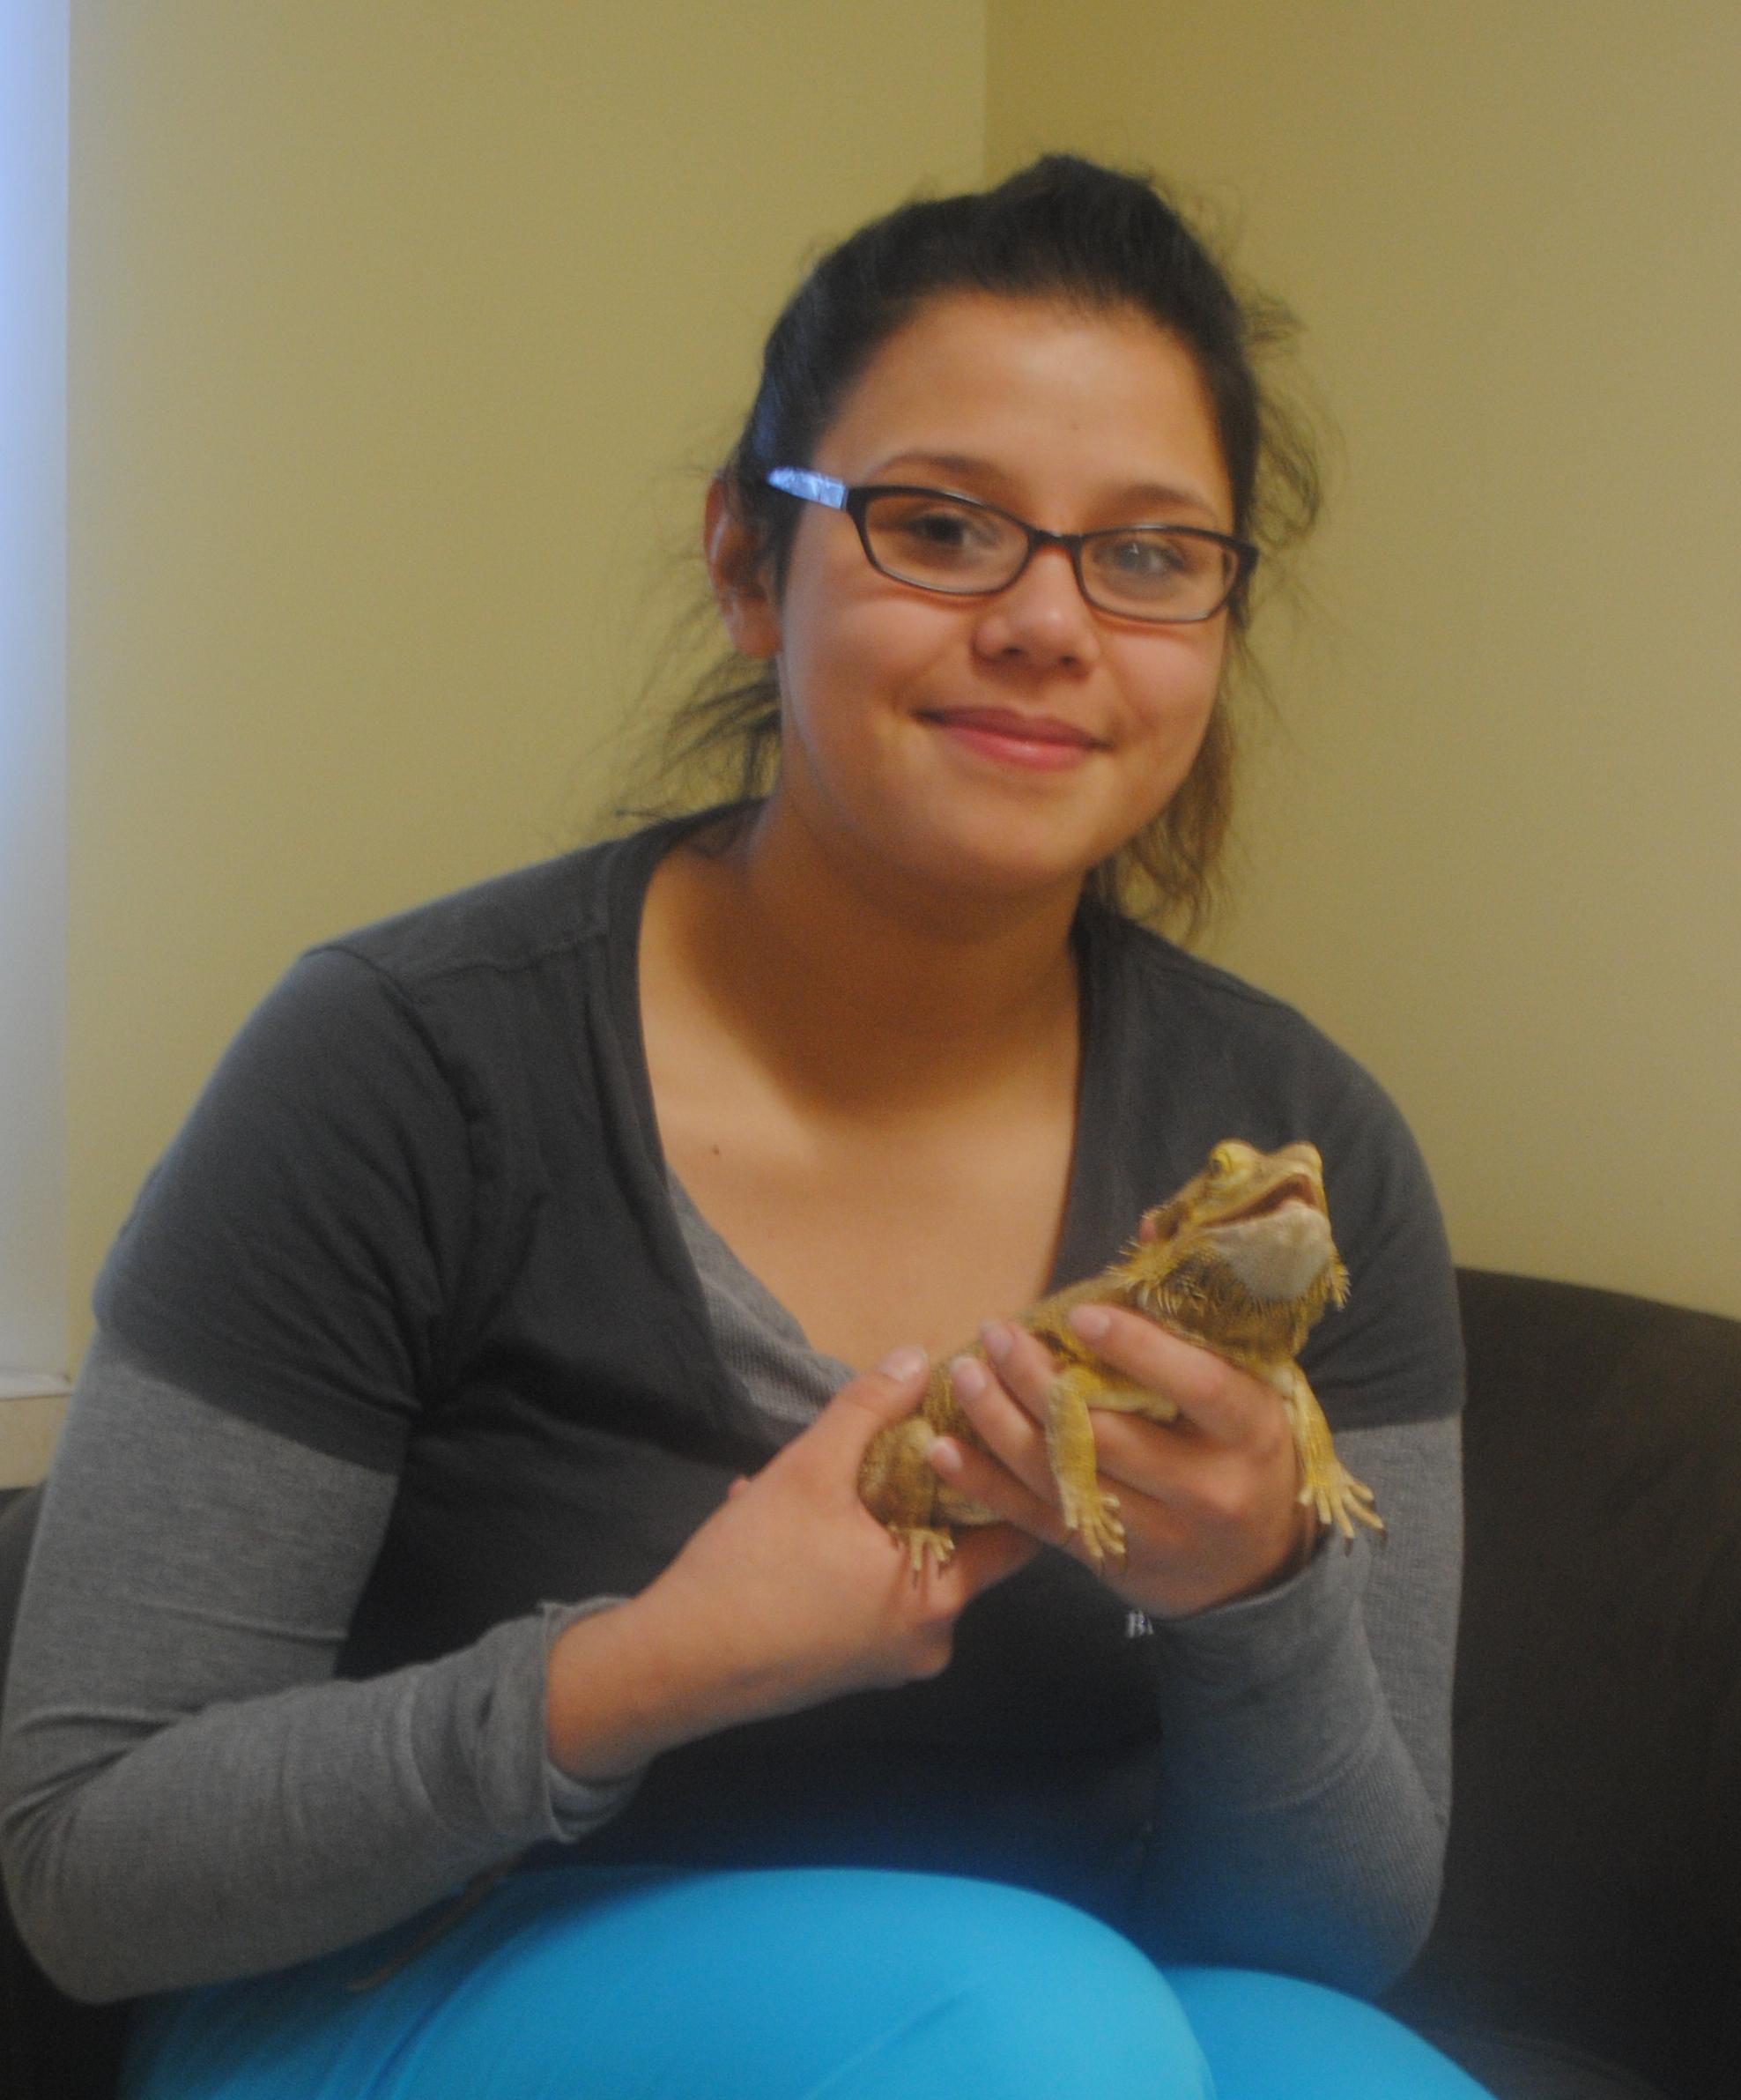 kensington bird and animal hospital veterinarians and staff briana ayala